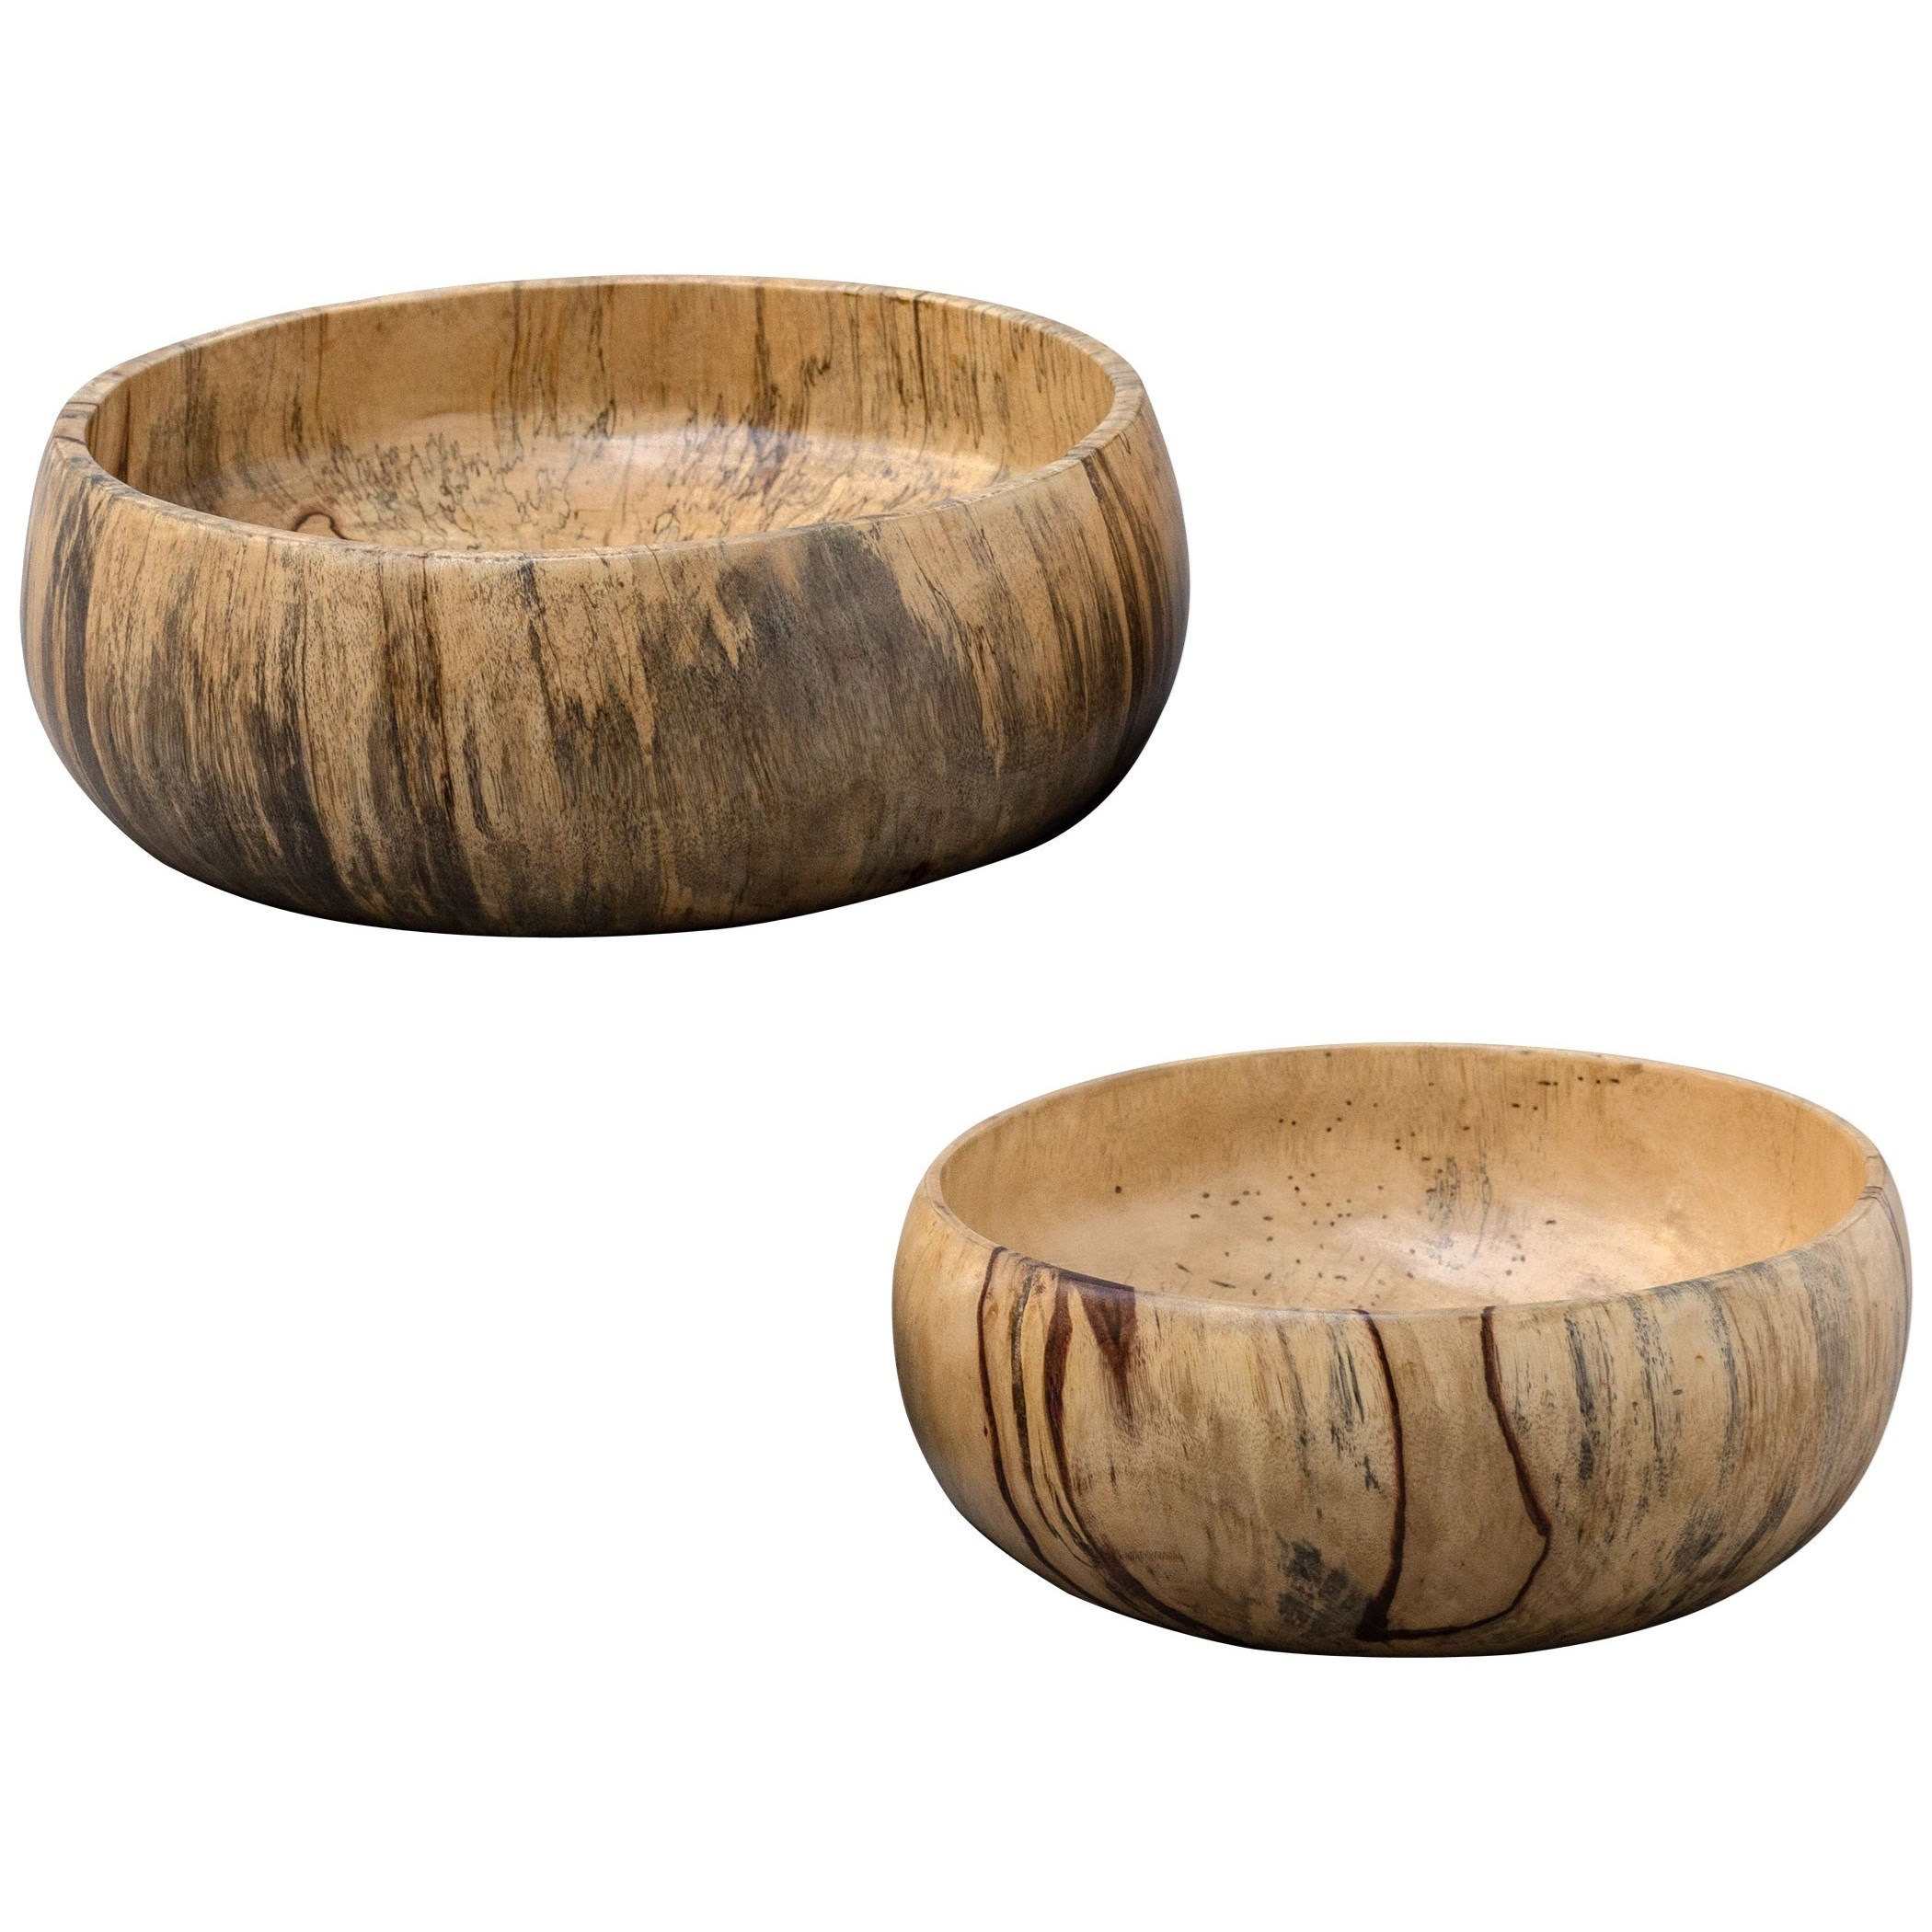 Tamarind Wood Bowls, S/2